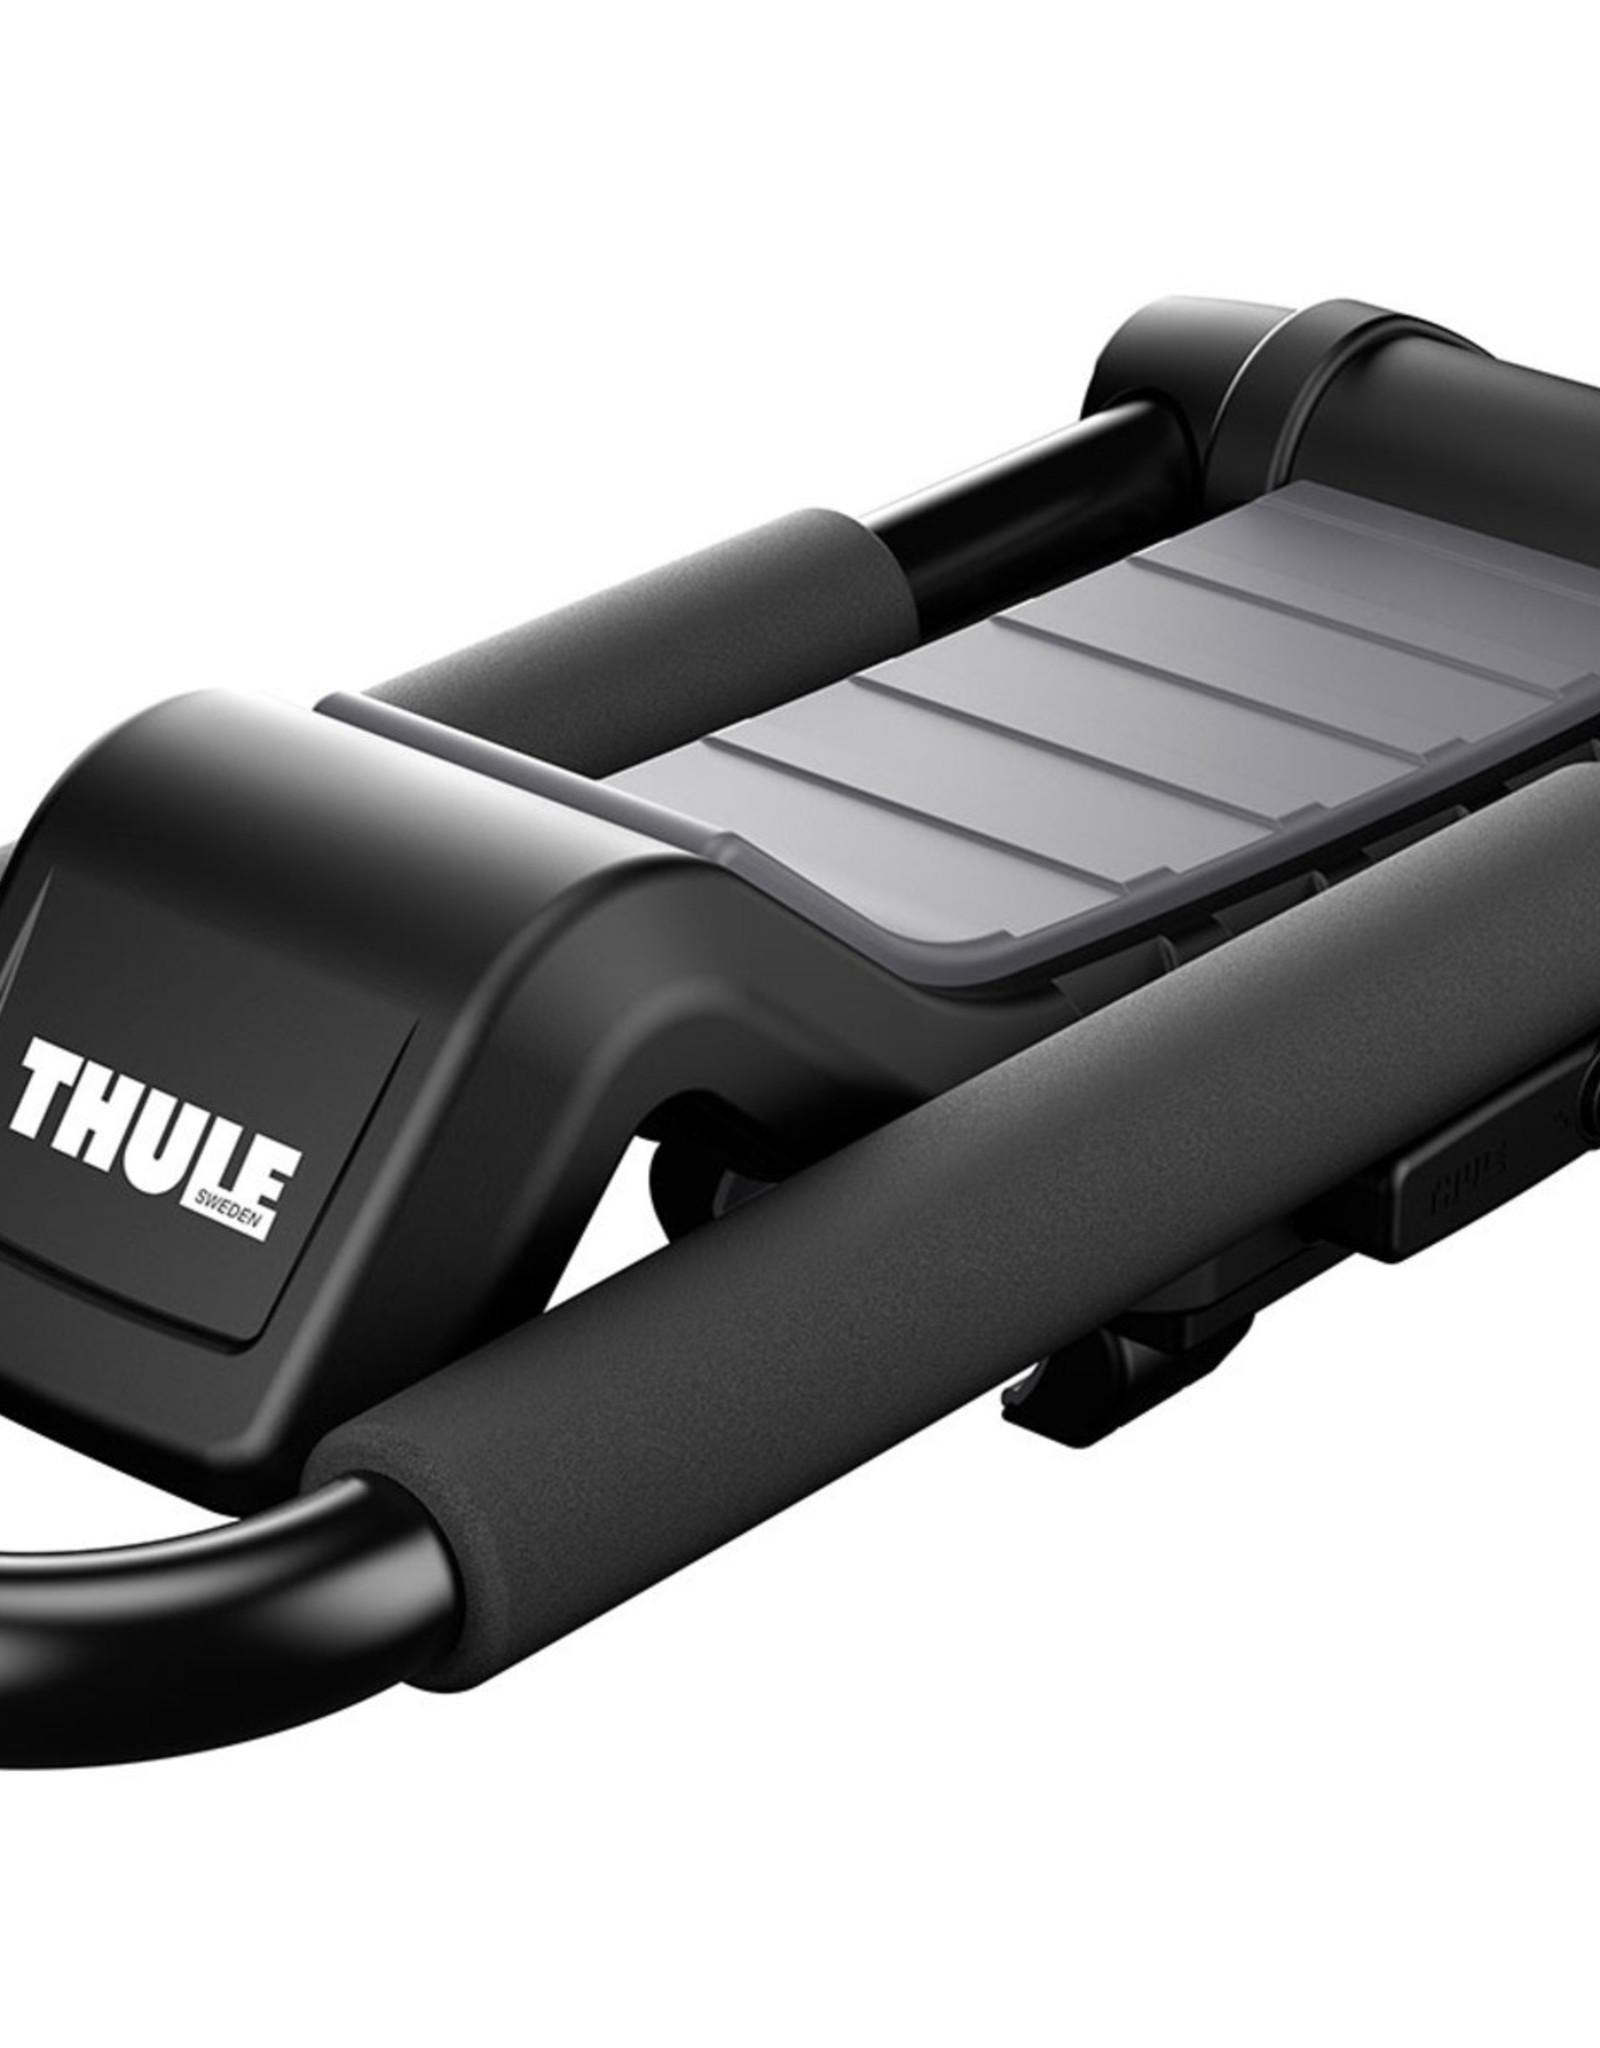 Thule Hull-a-port XT Kayak Rack